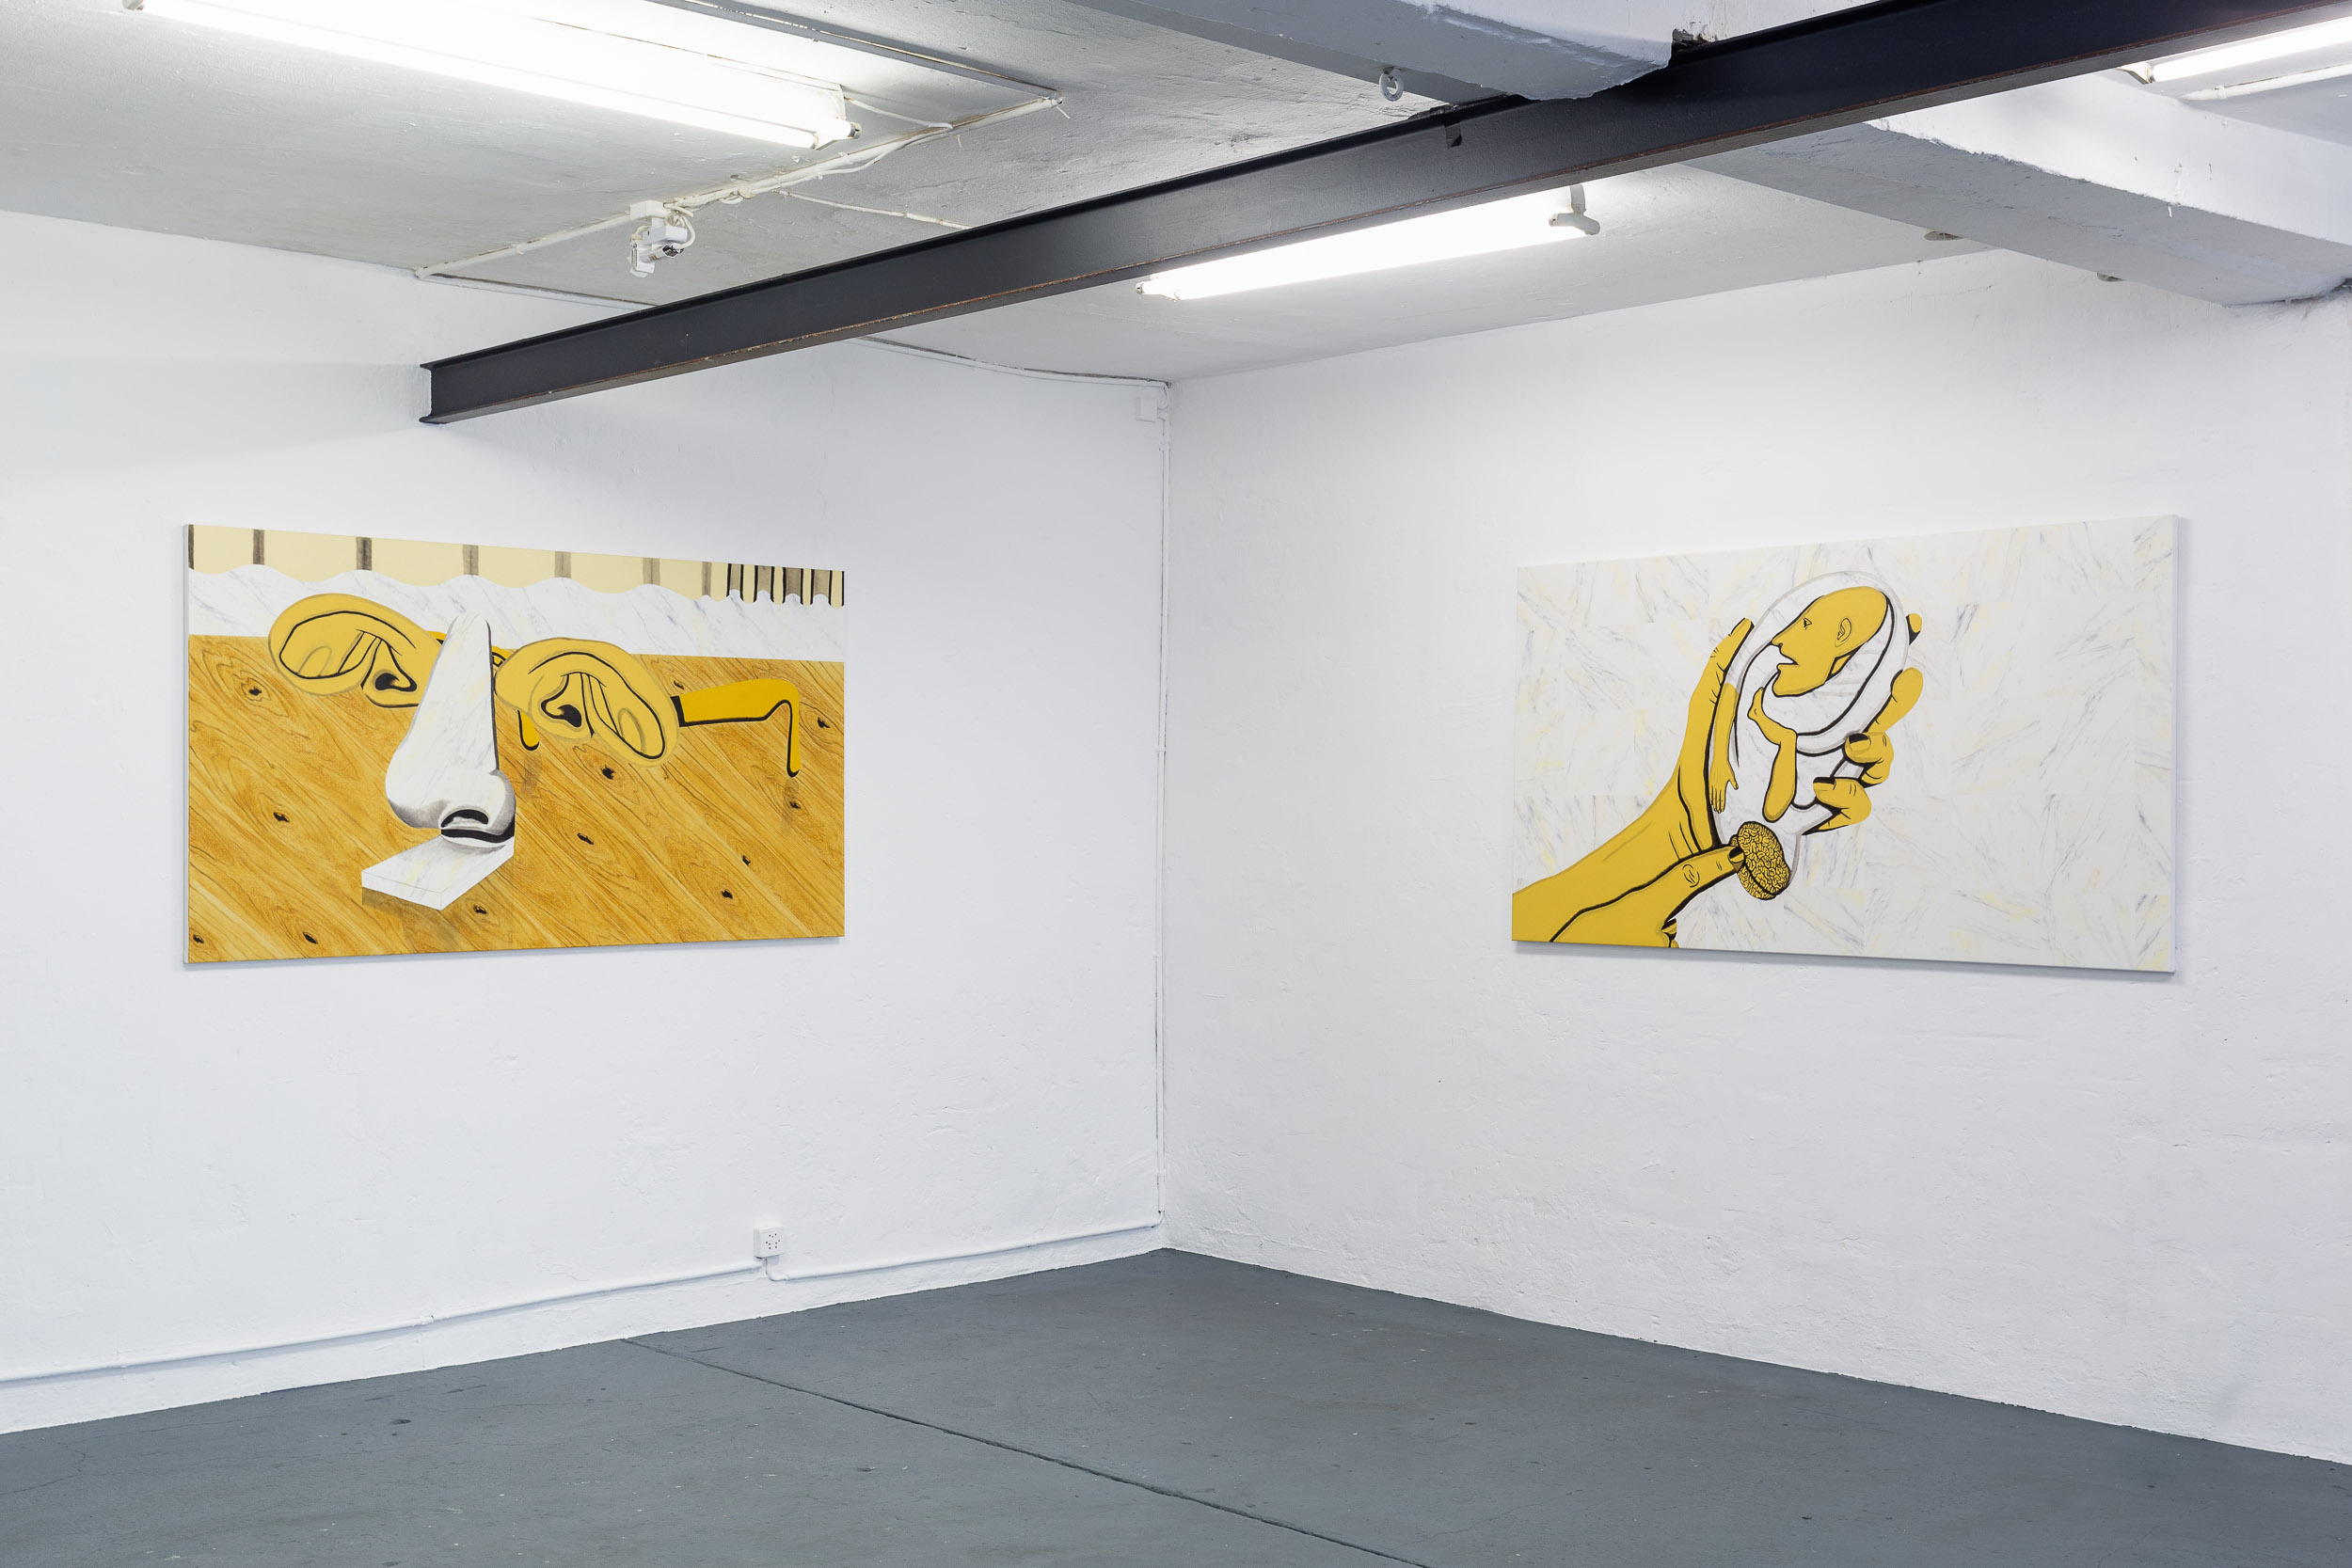 Sarah Margnetti, installation view Photo: Kilian Bannwart